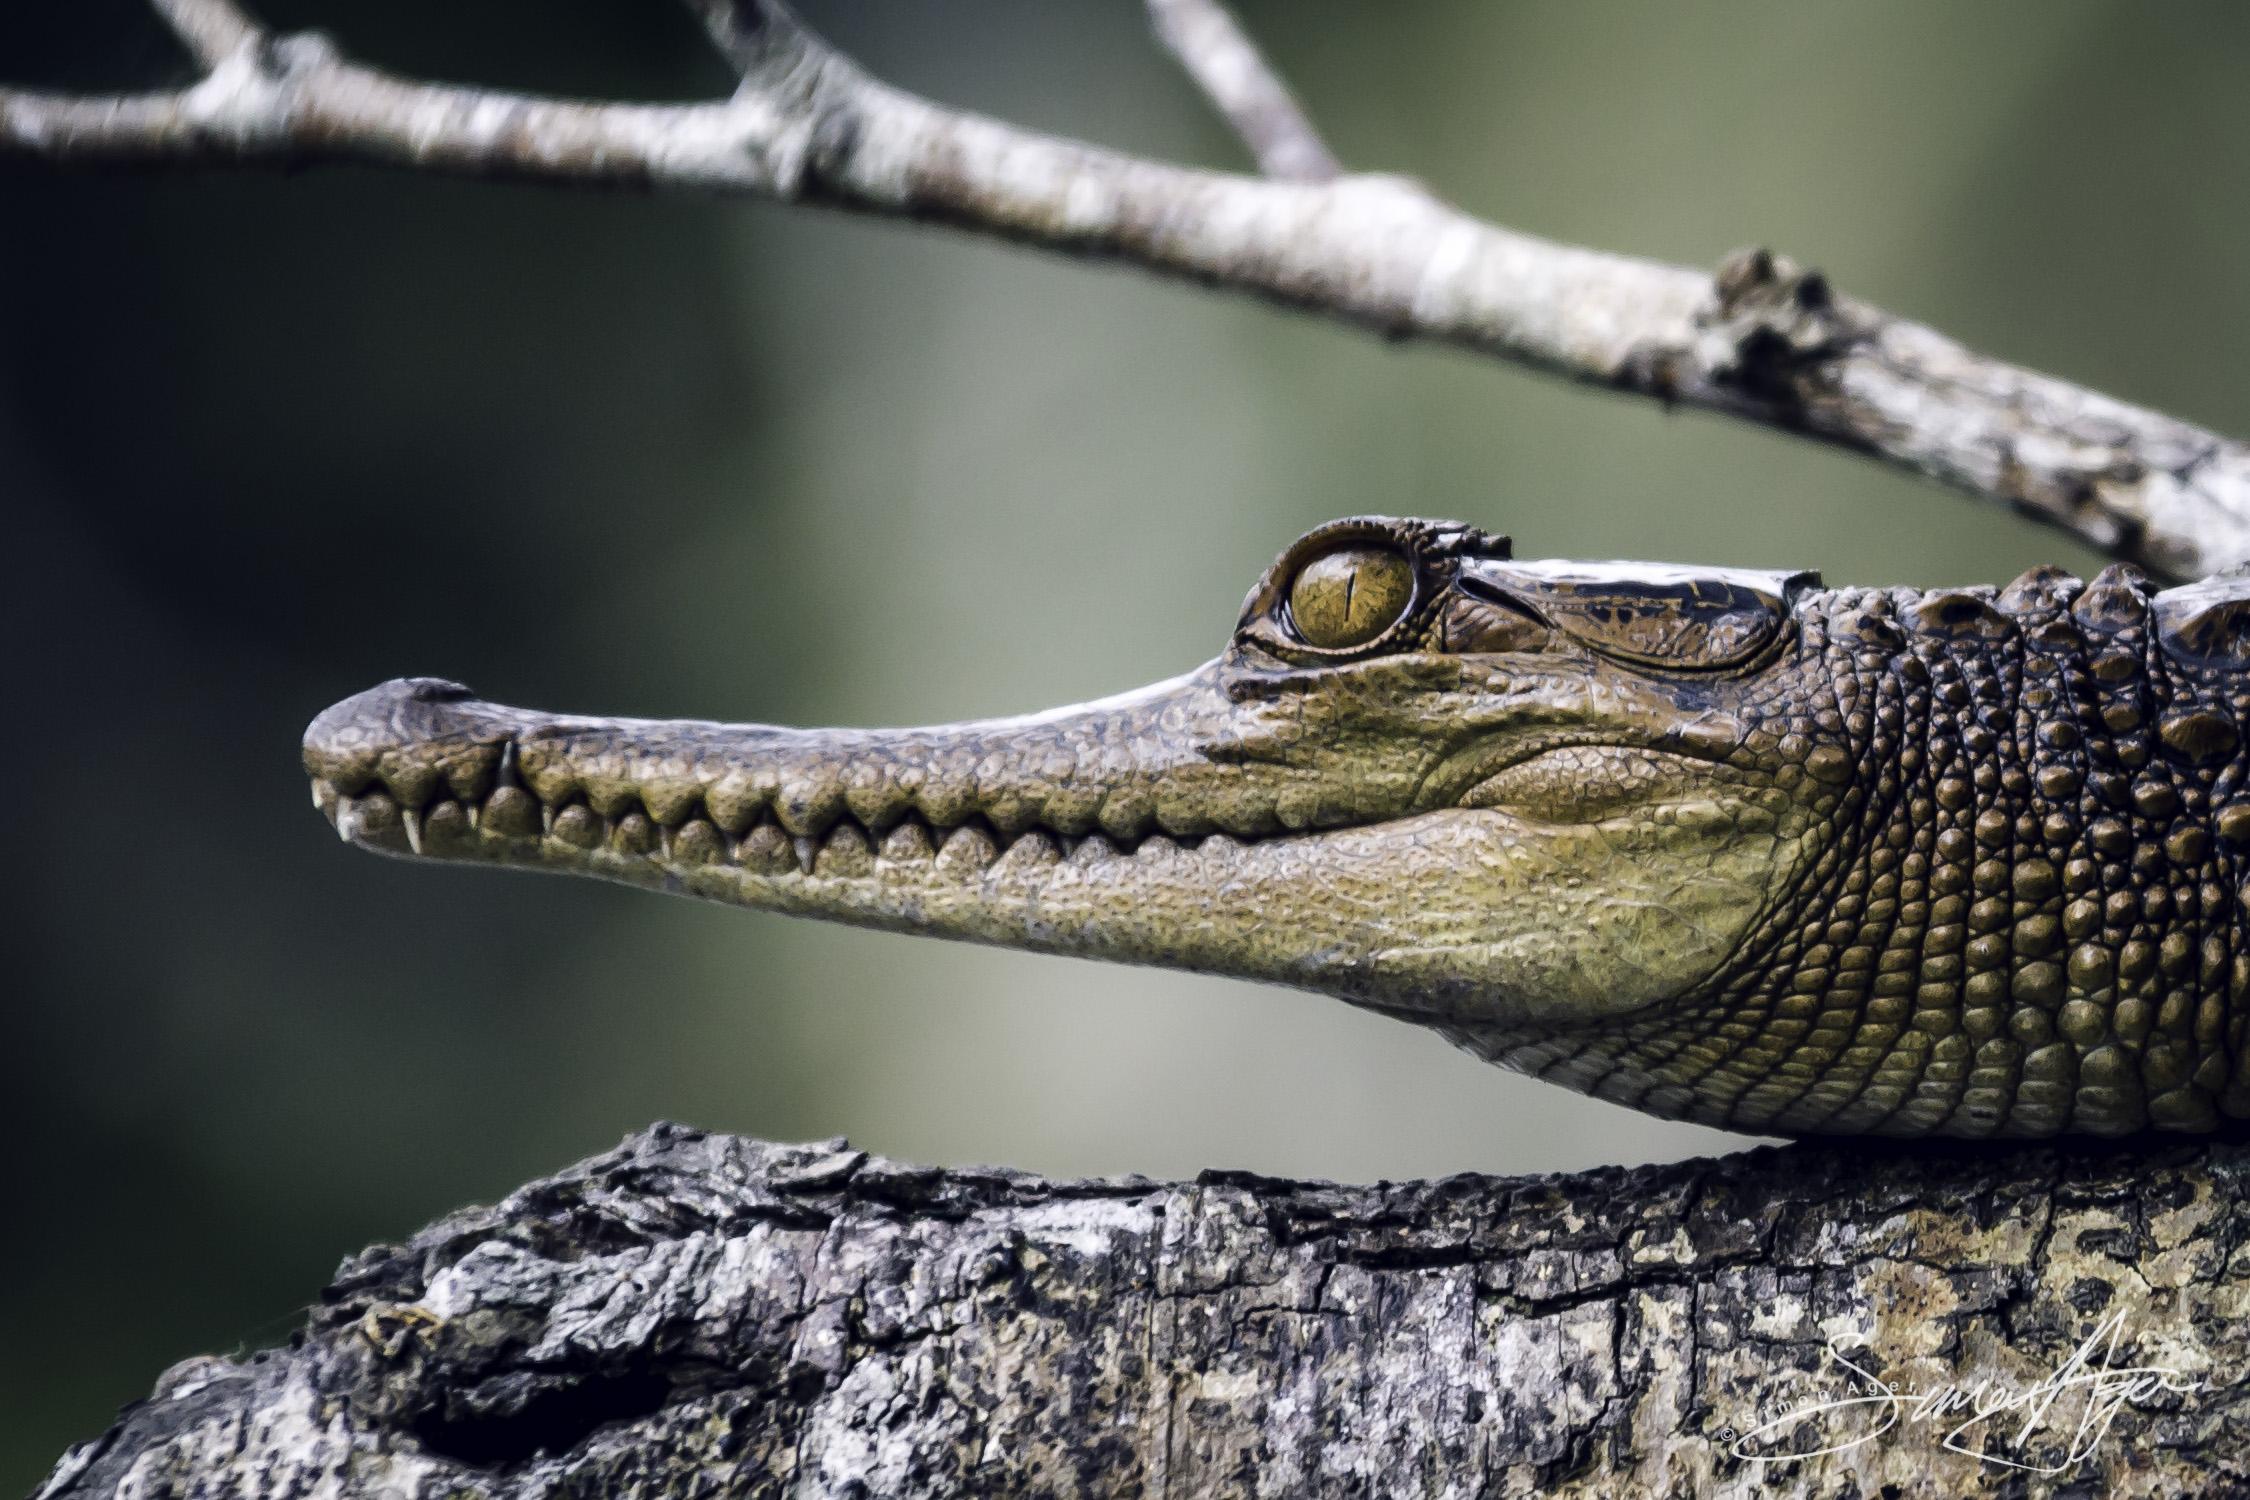 160618-SA-A5243 Juvenile Crocodiles